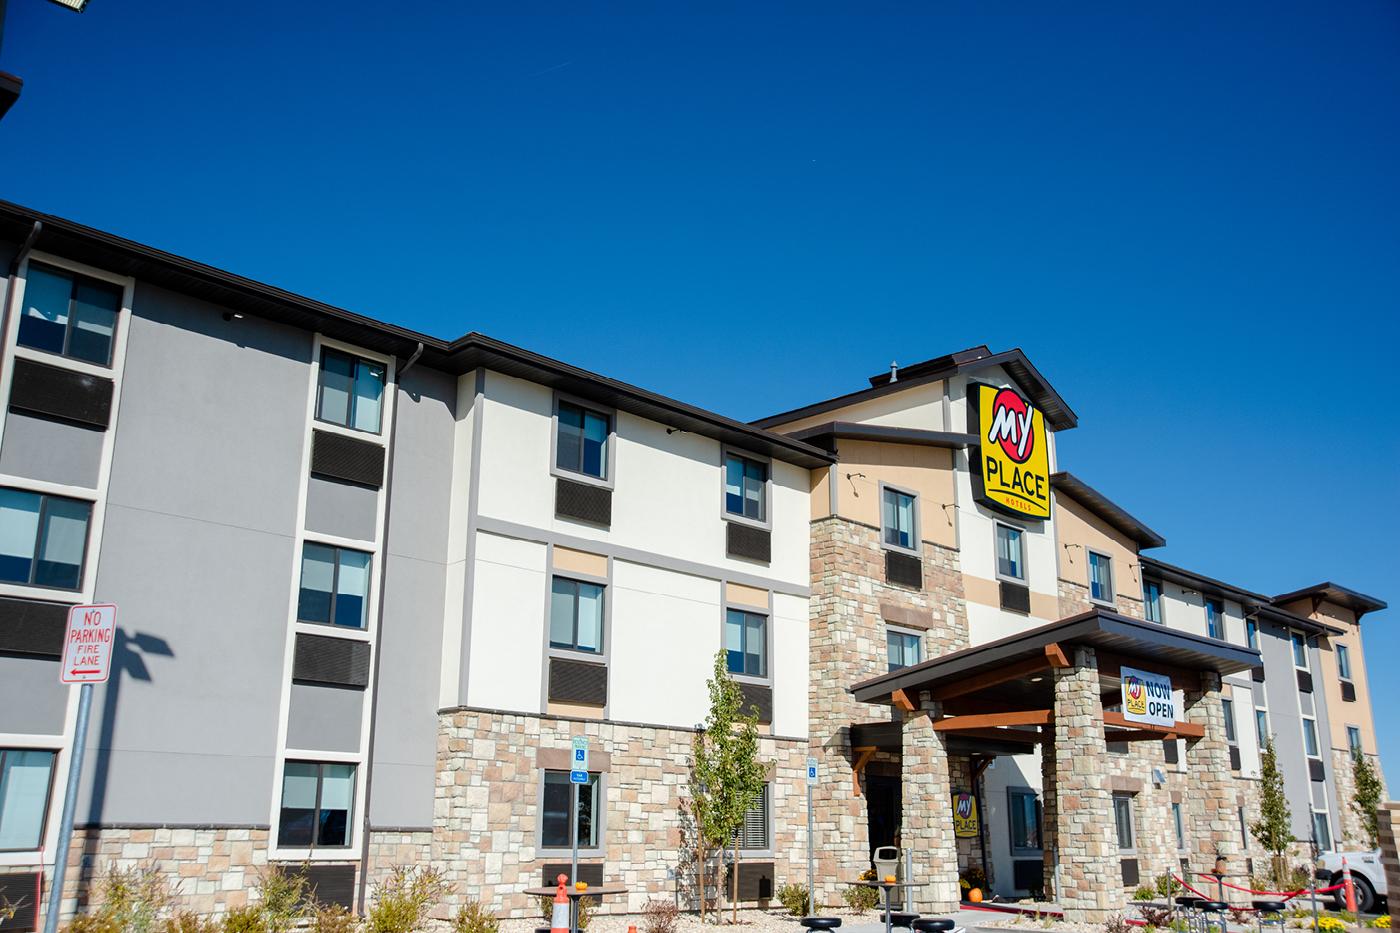 My Place Hotel Carson City Nv